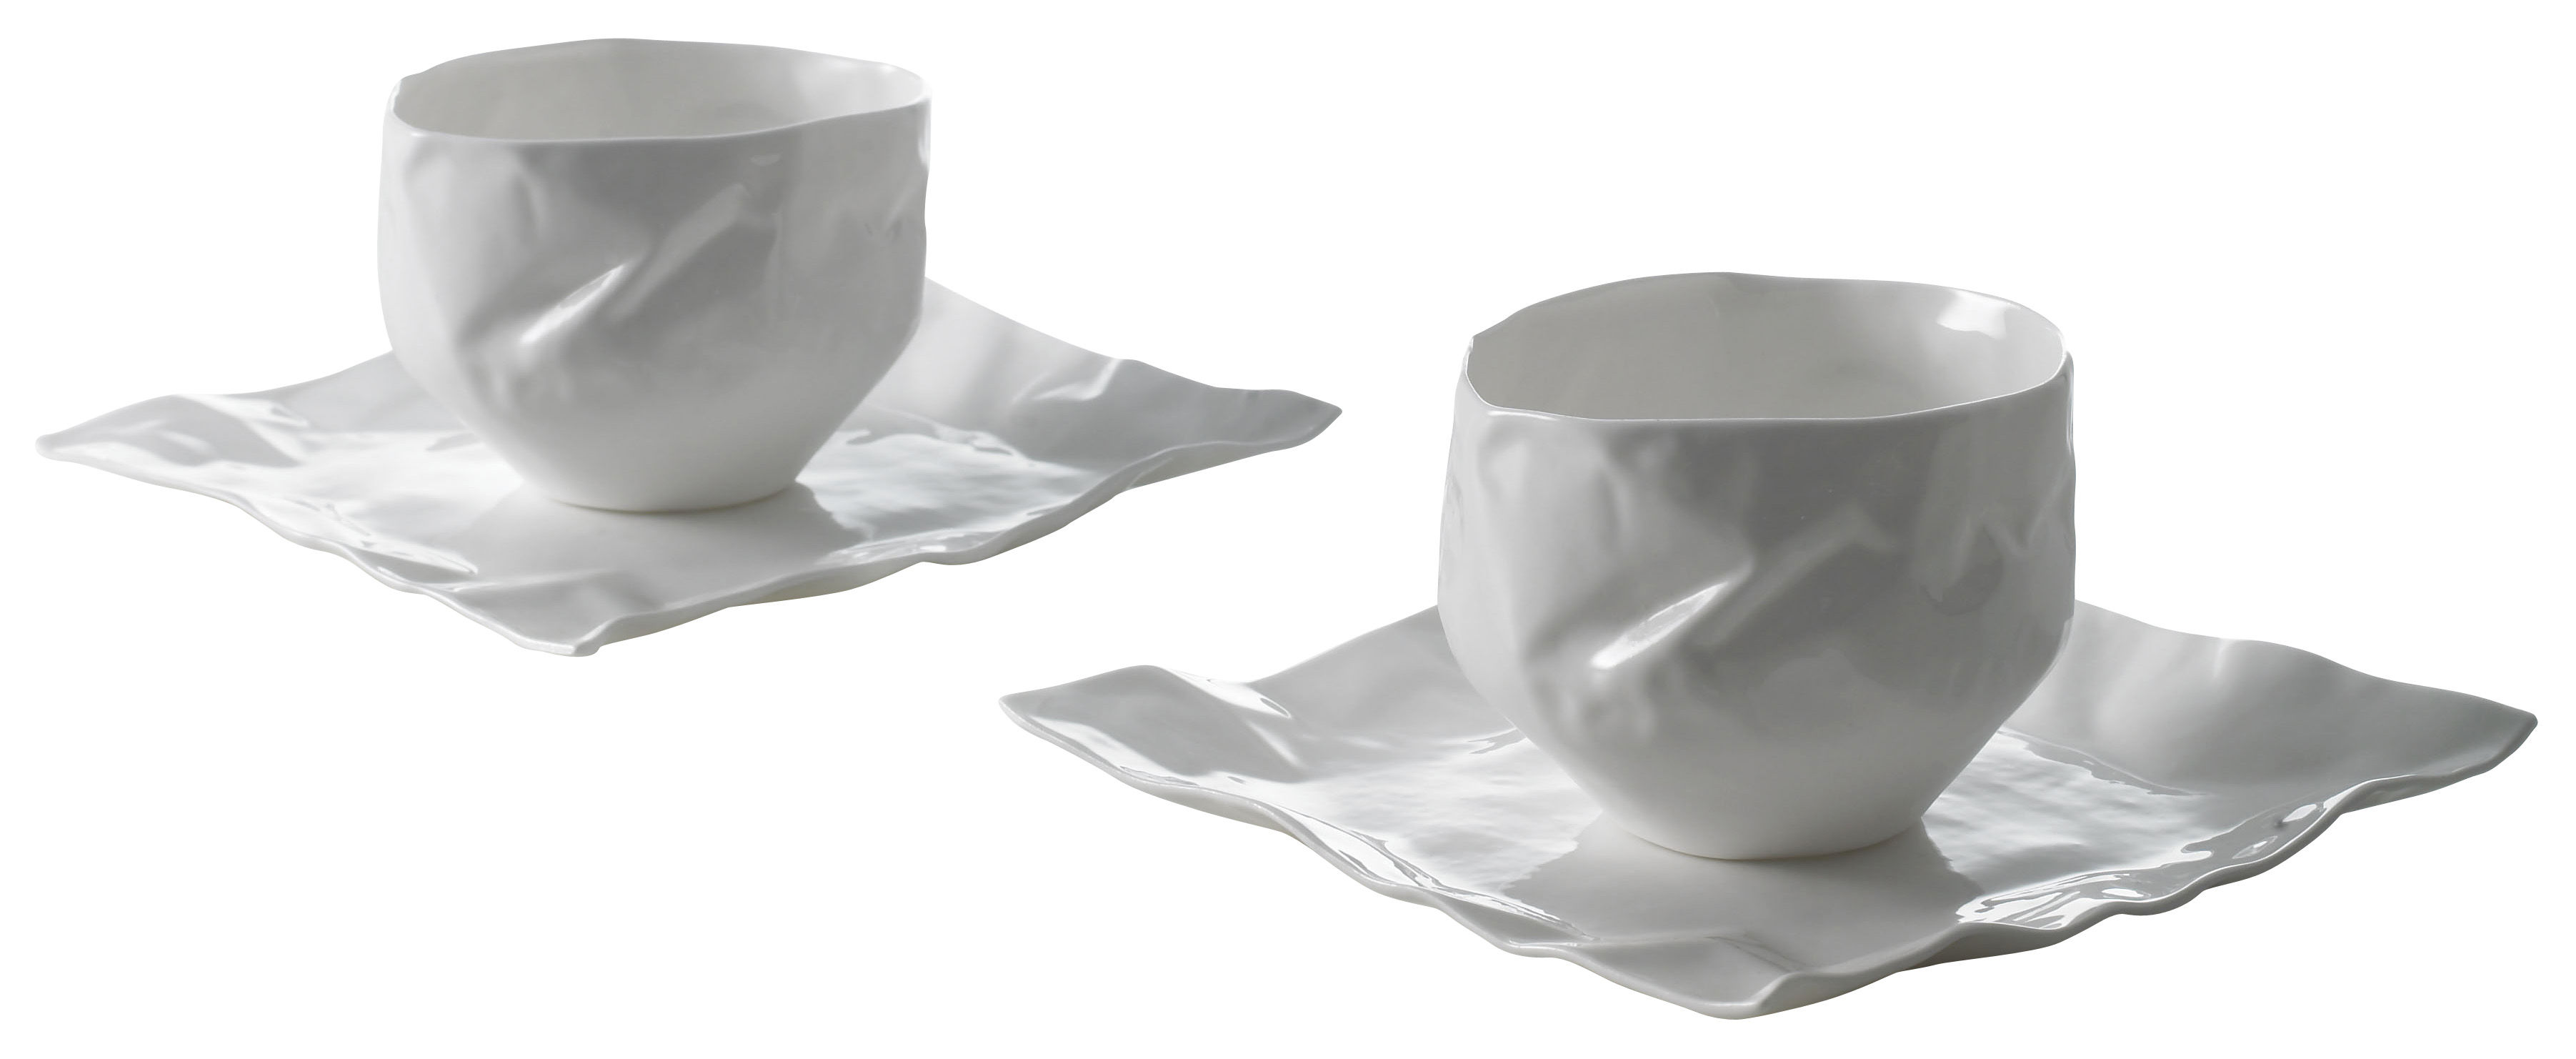 Tableware - Coffee Mugs & Tea Cups - Adelaïde XIV Tableware set - 2 cups + 2 saucers by Driade Kosmo - White - Bone china